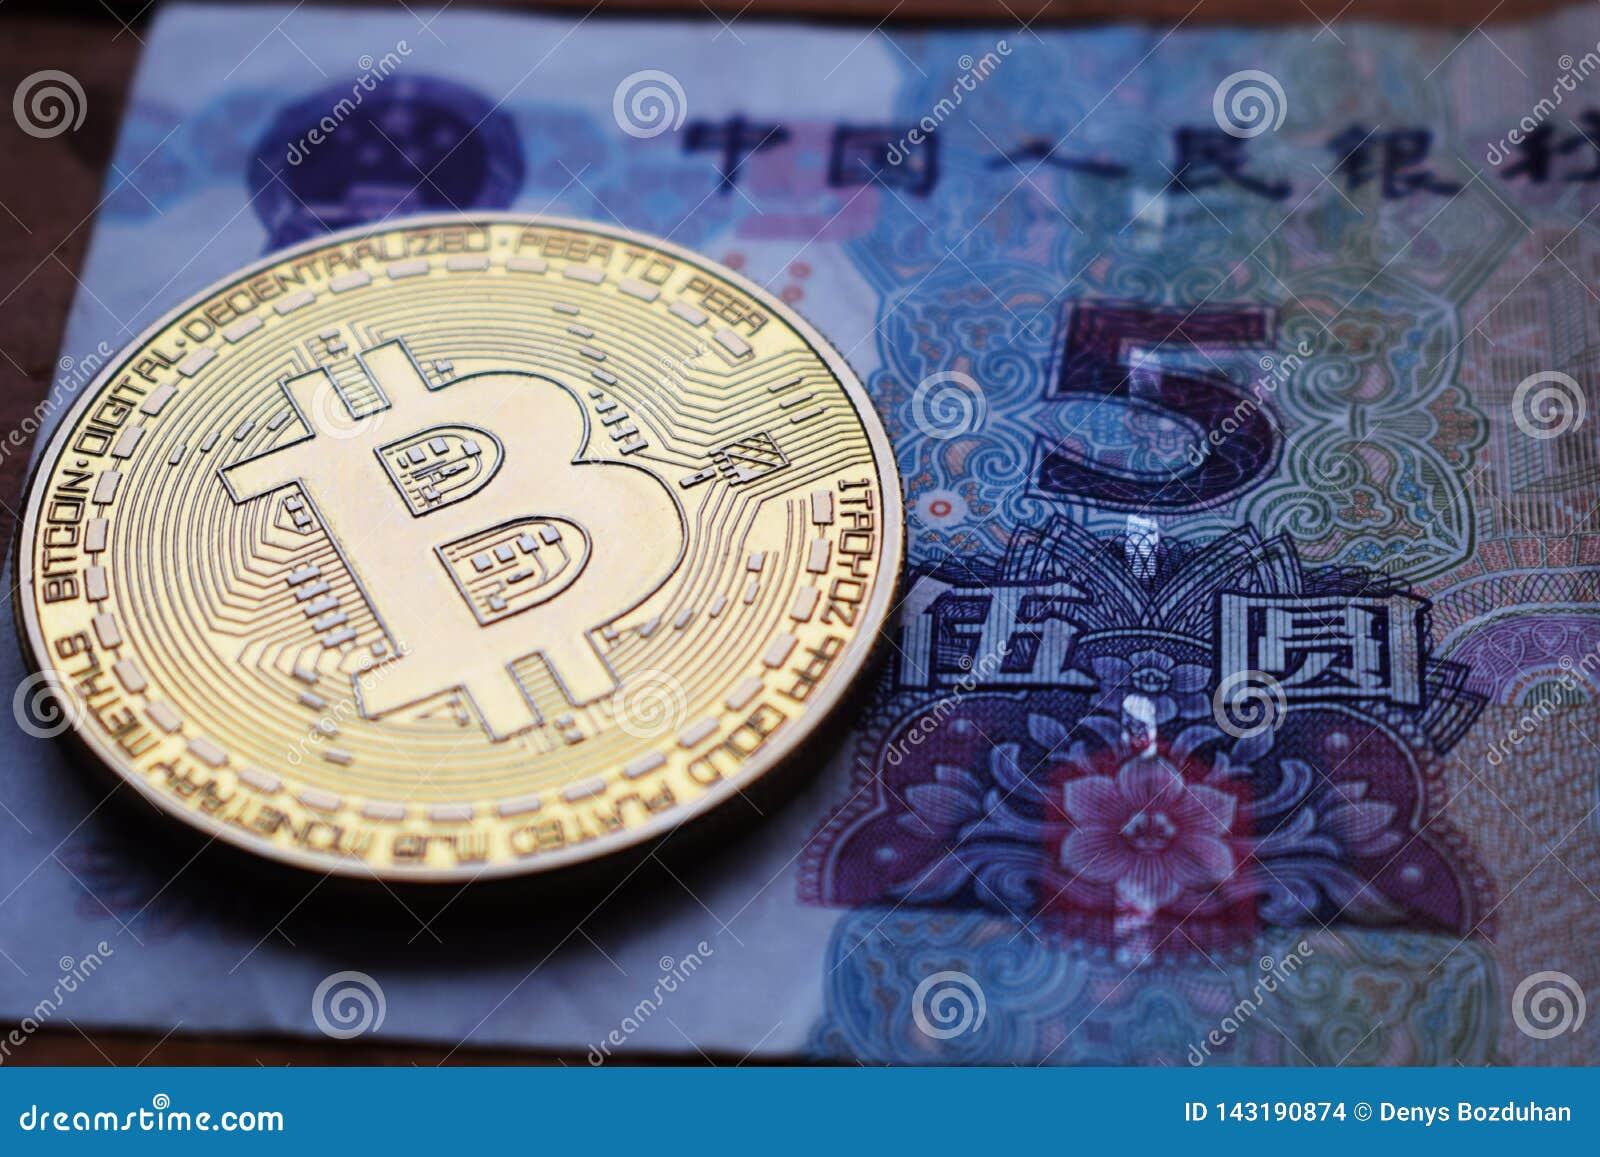 bitcoin gold in china